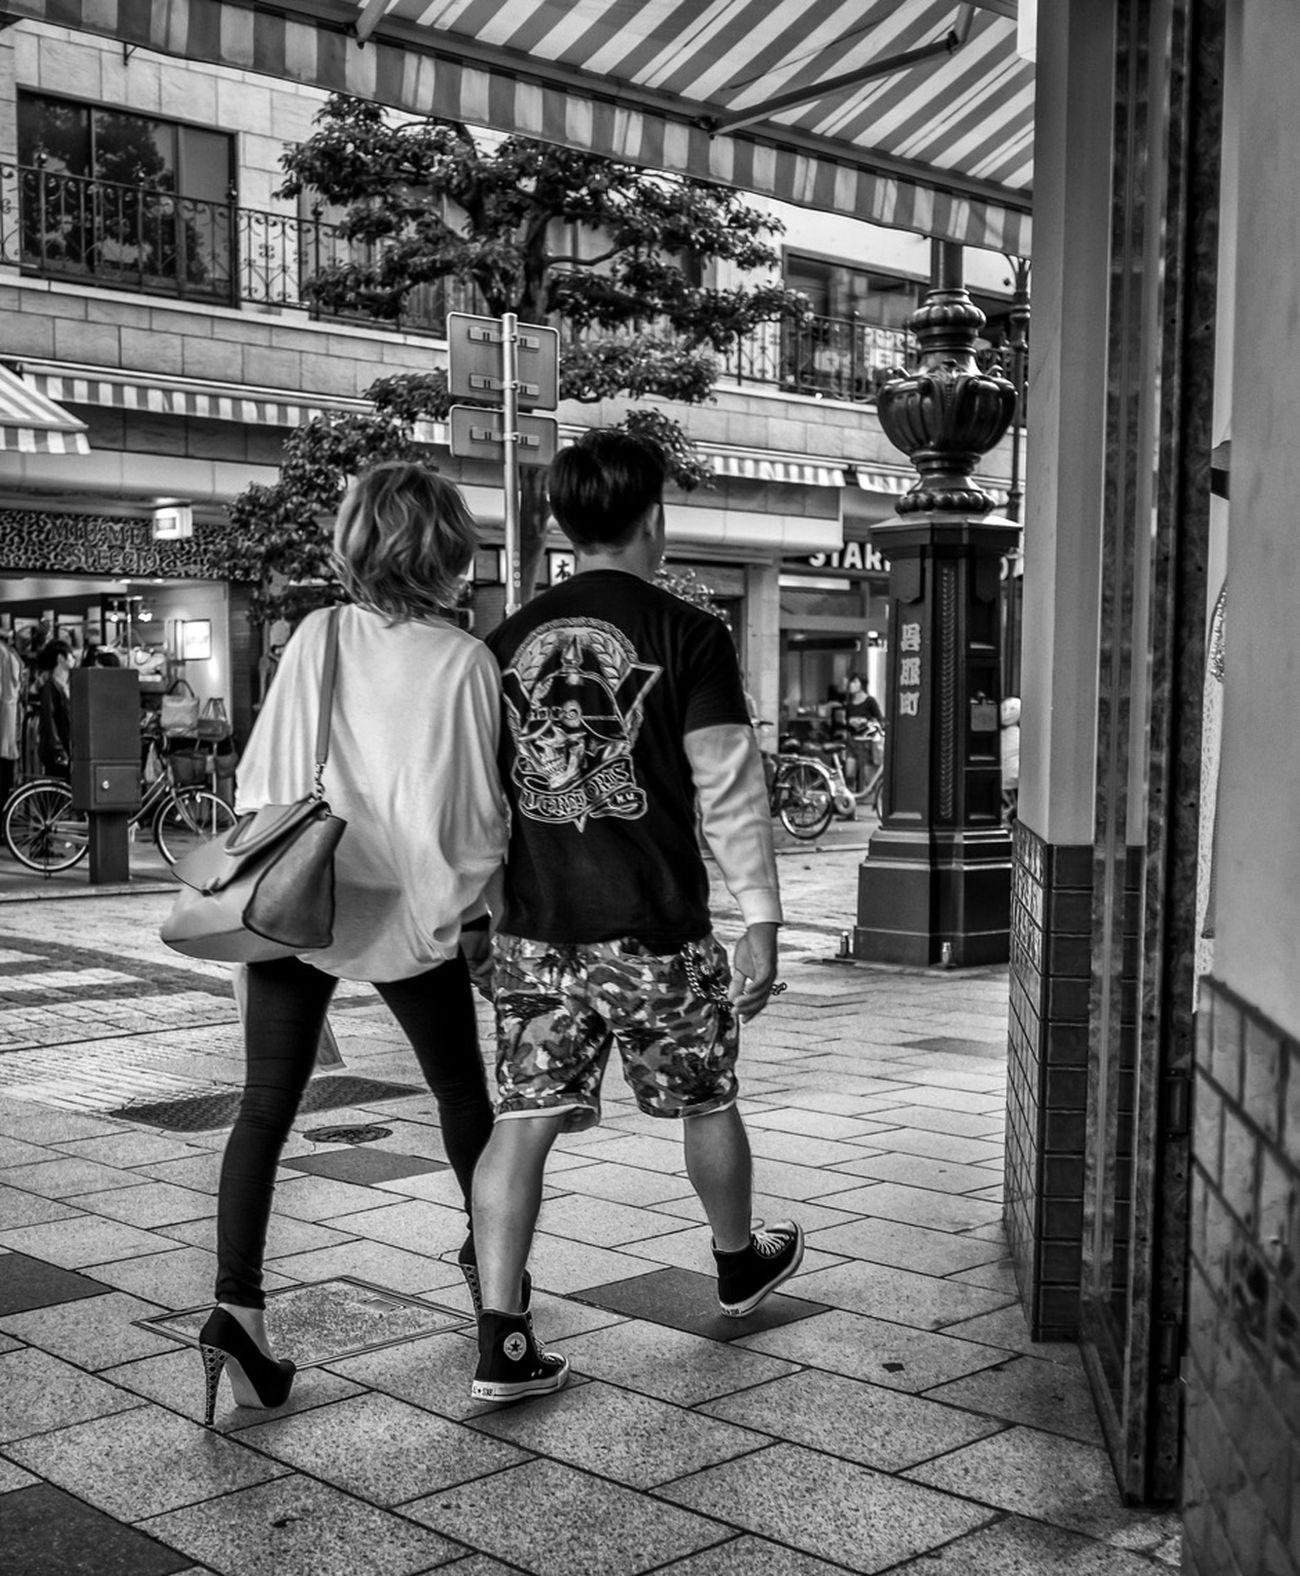 High Tops and High Heels Japan Japanese  Streetphotography Street Fashion Streetphoto_bw Blackandwhite Monochrome Couple Love FujiX100S